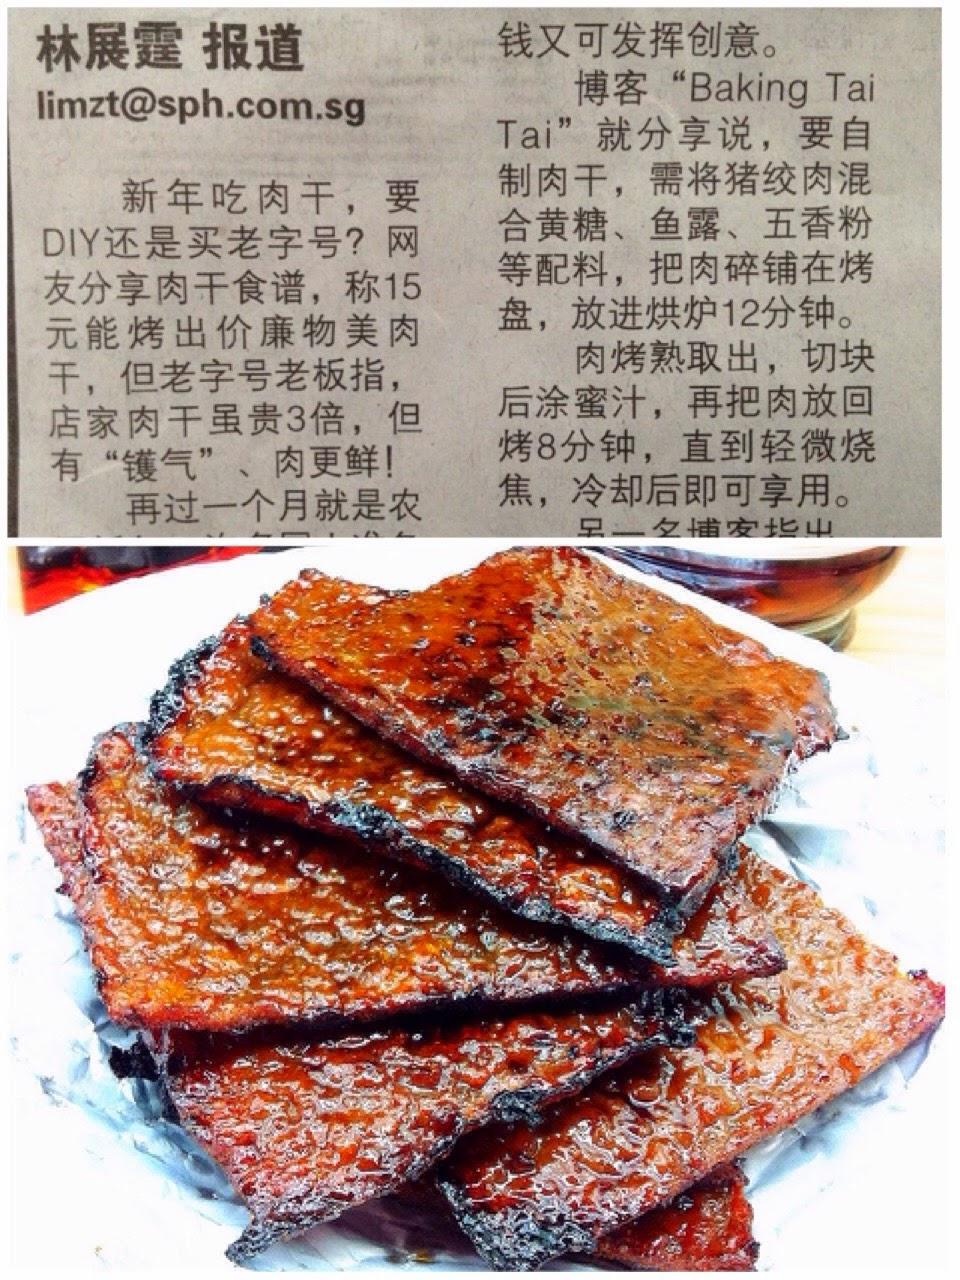 Bak Kwa Recipe on WB News 肉干食谱上晚报新闻 17/1/2015